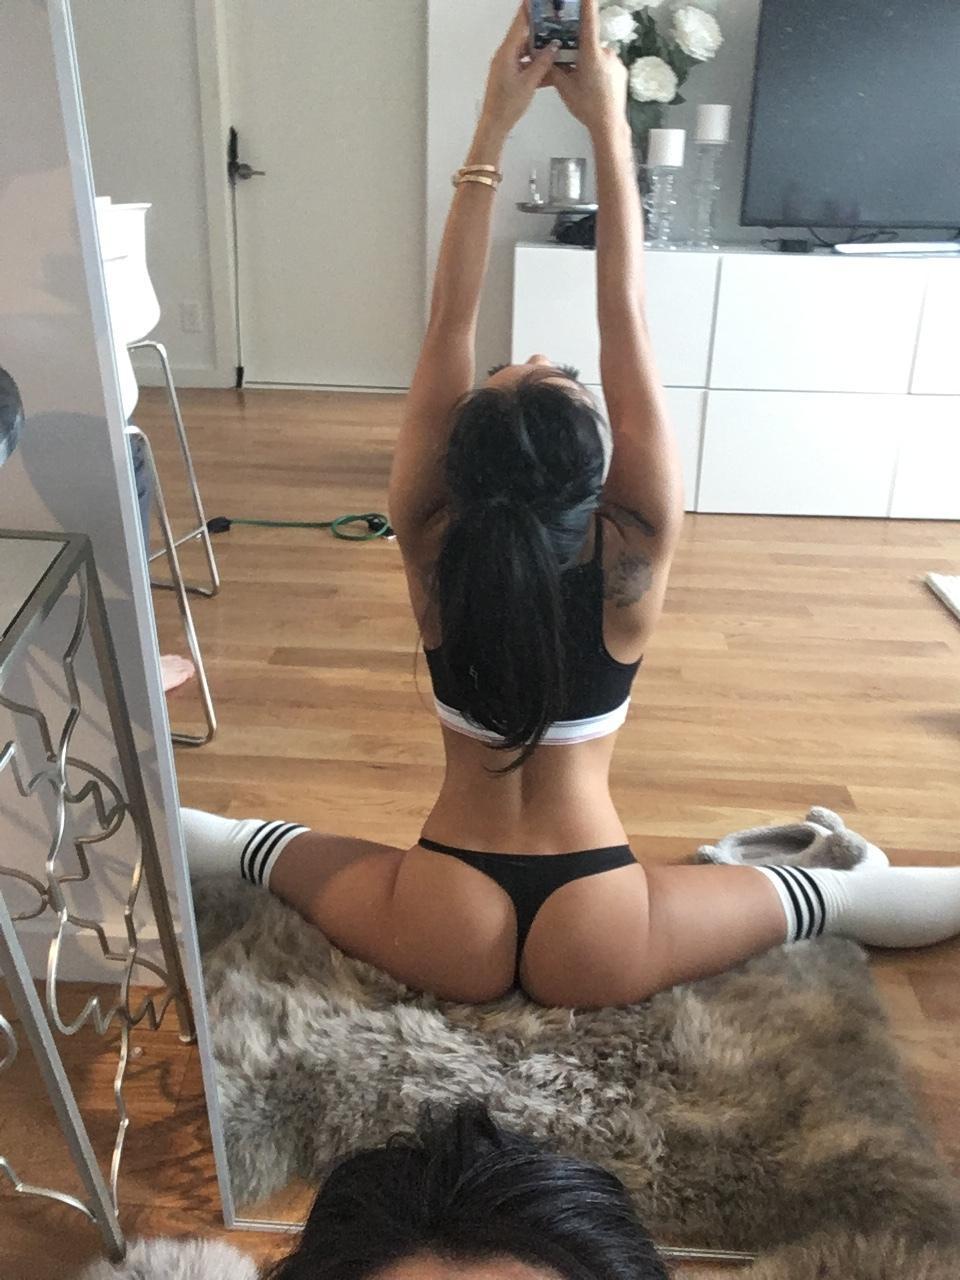 Asa Akira Nude Mirror Selfie Onlyfans Set Leaked Qiookx